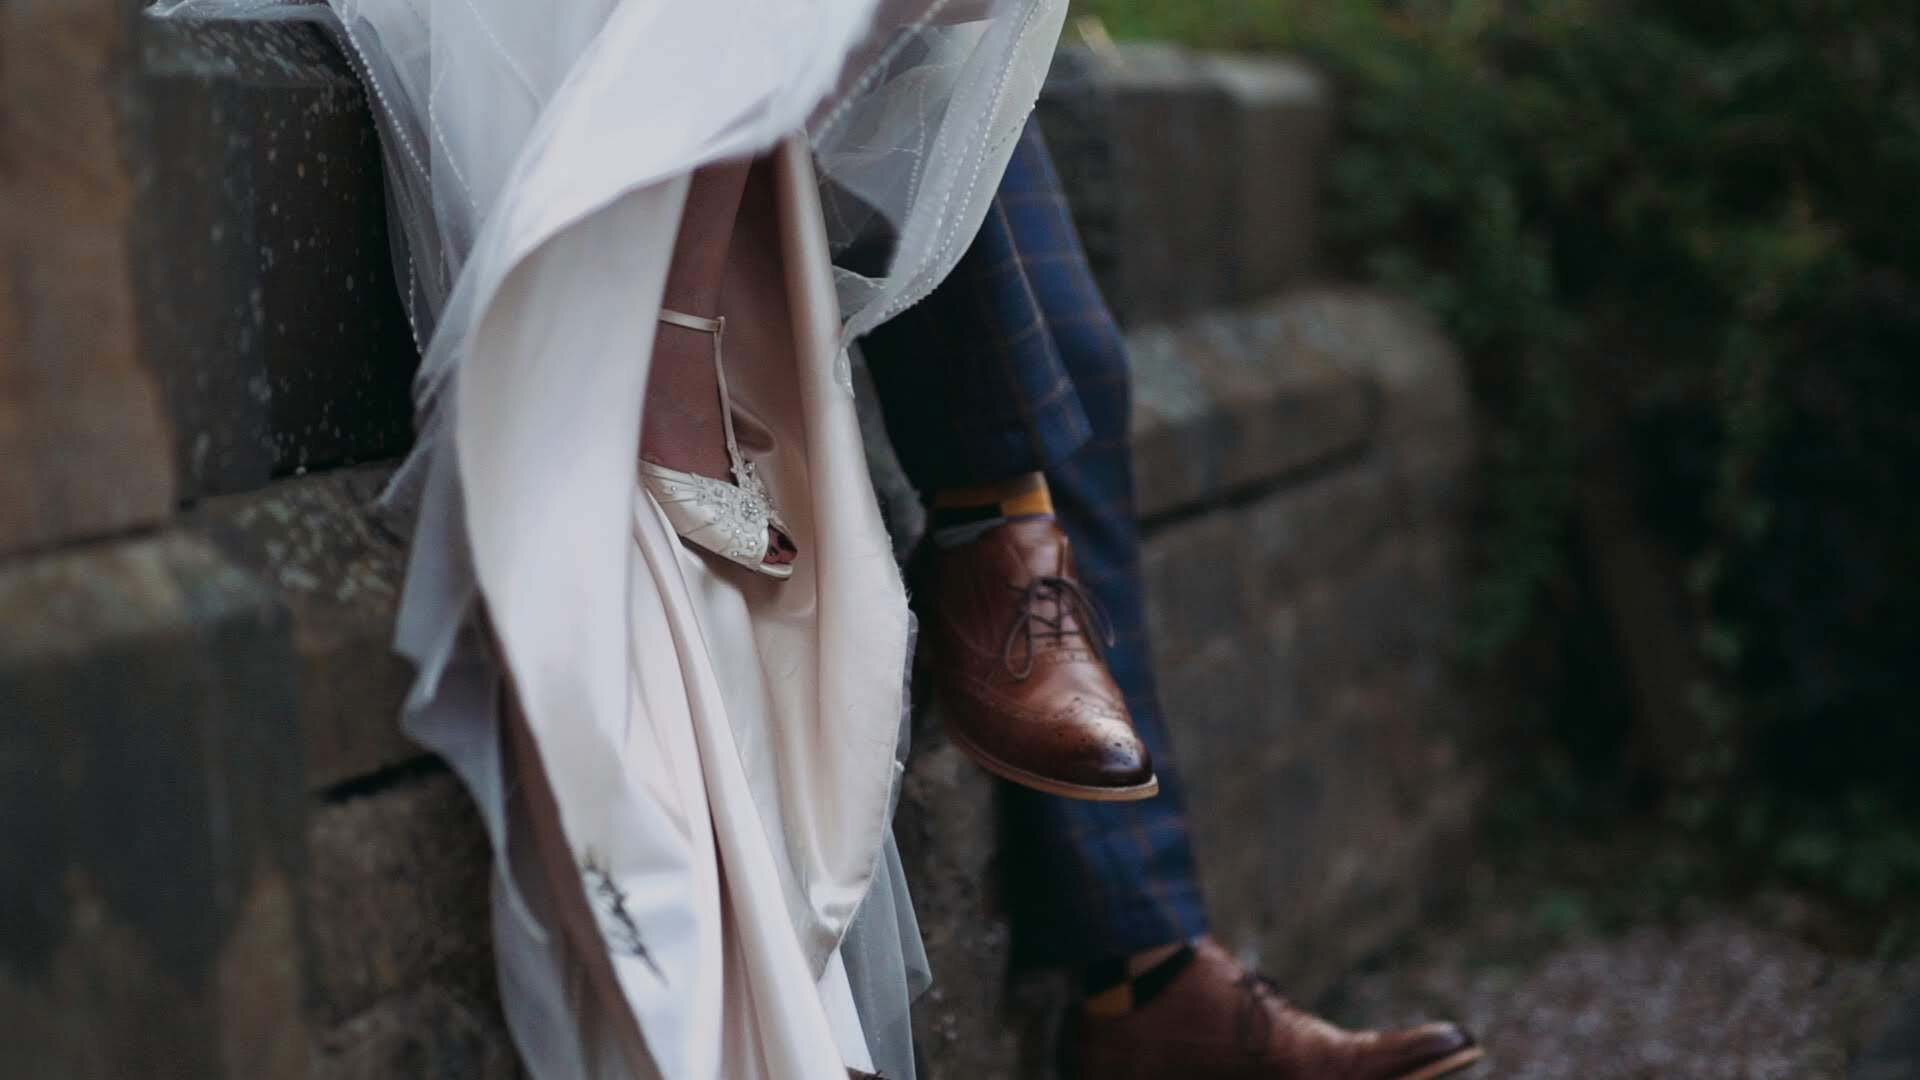 Wedding-Couple-Feet-Sitting-on-Wall-Pocket-Jacks-Films-UK-Wedding-Videographer